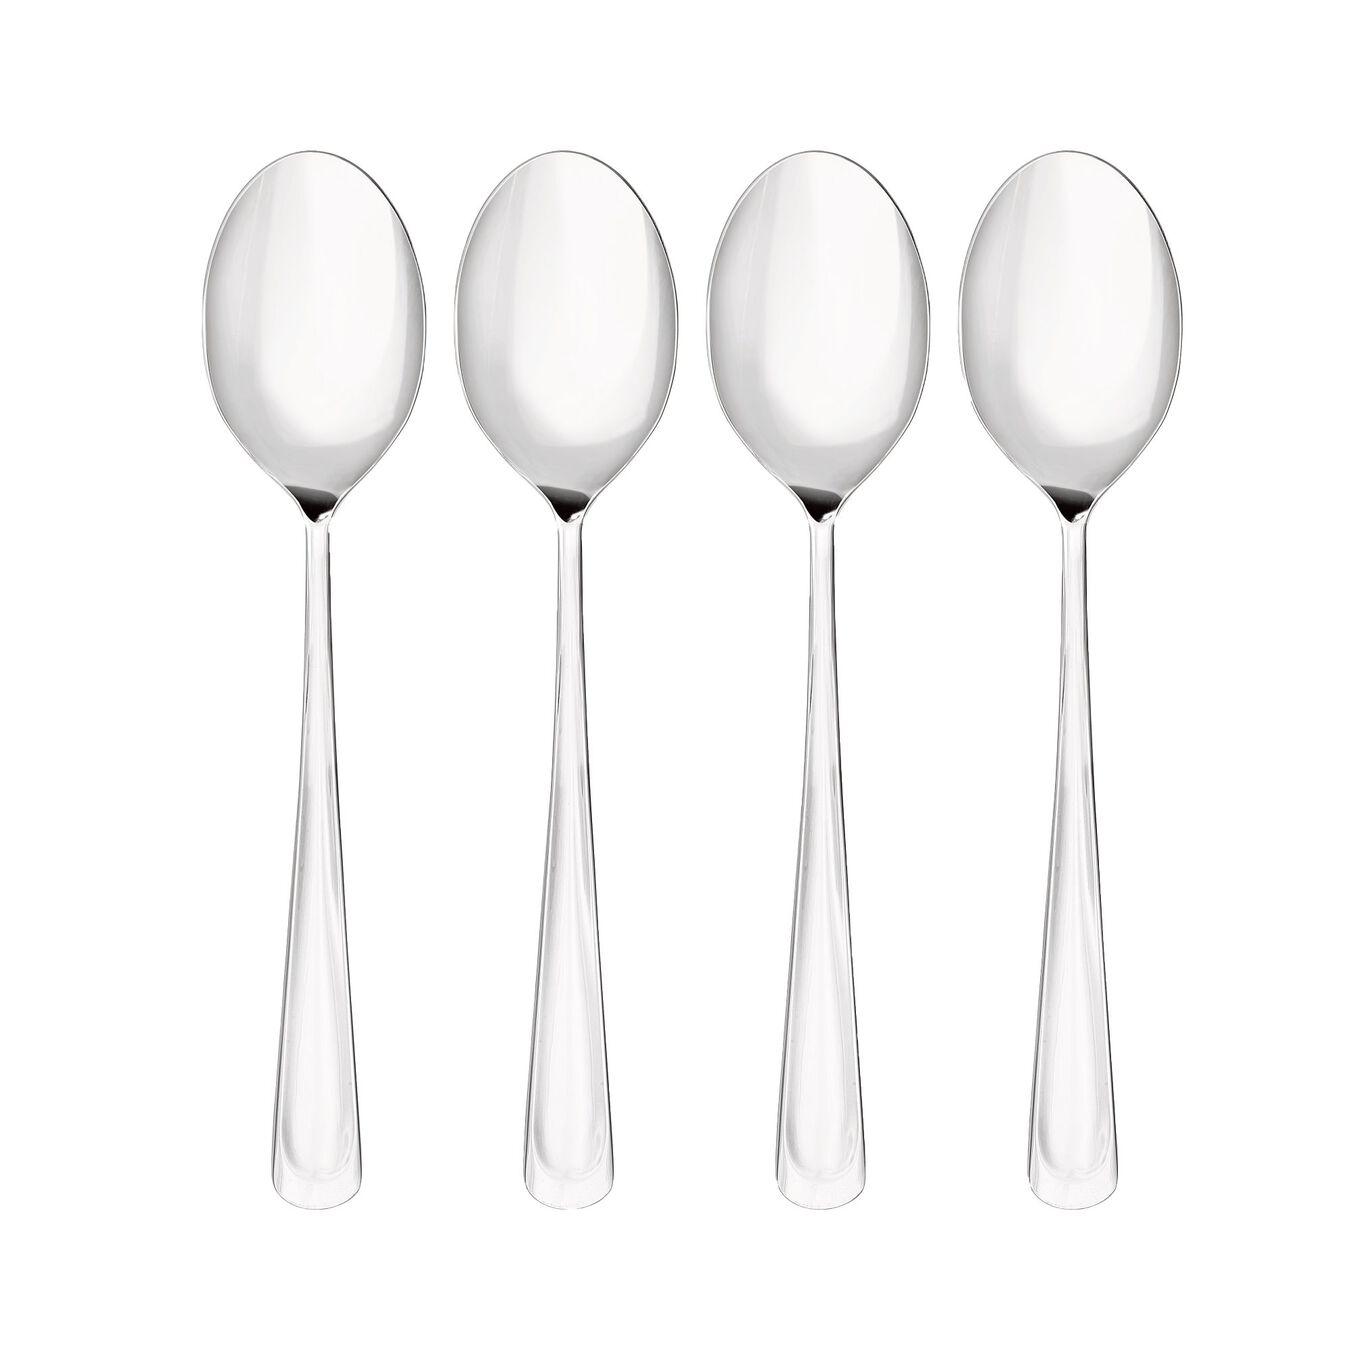 Dinner spoon set, 4 Piece,,large 1